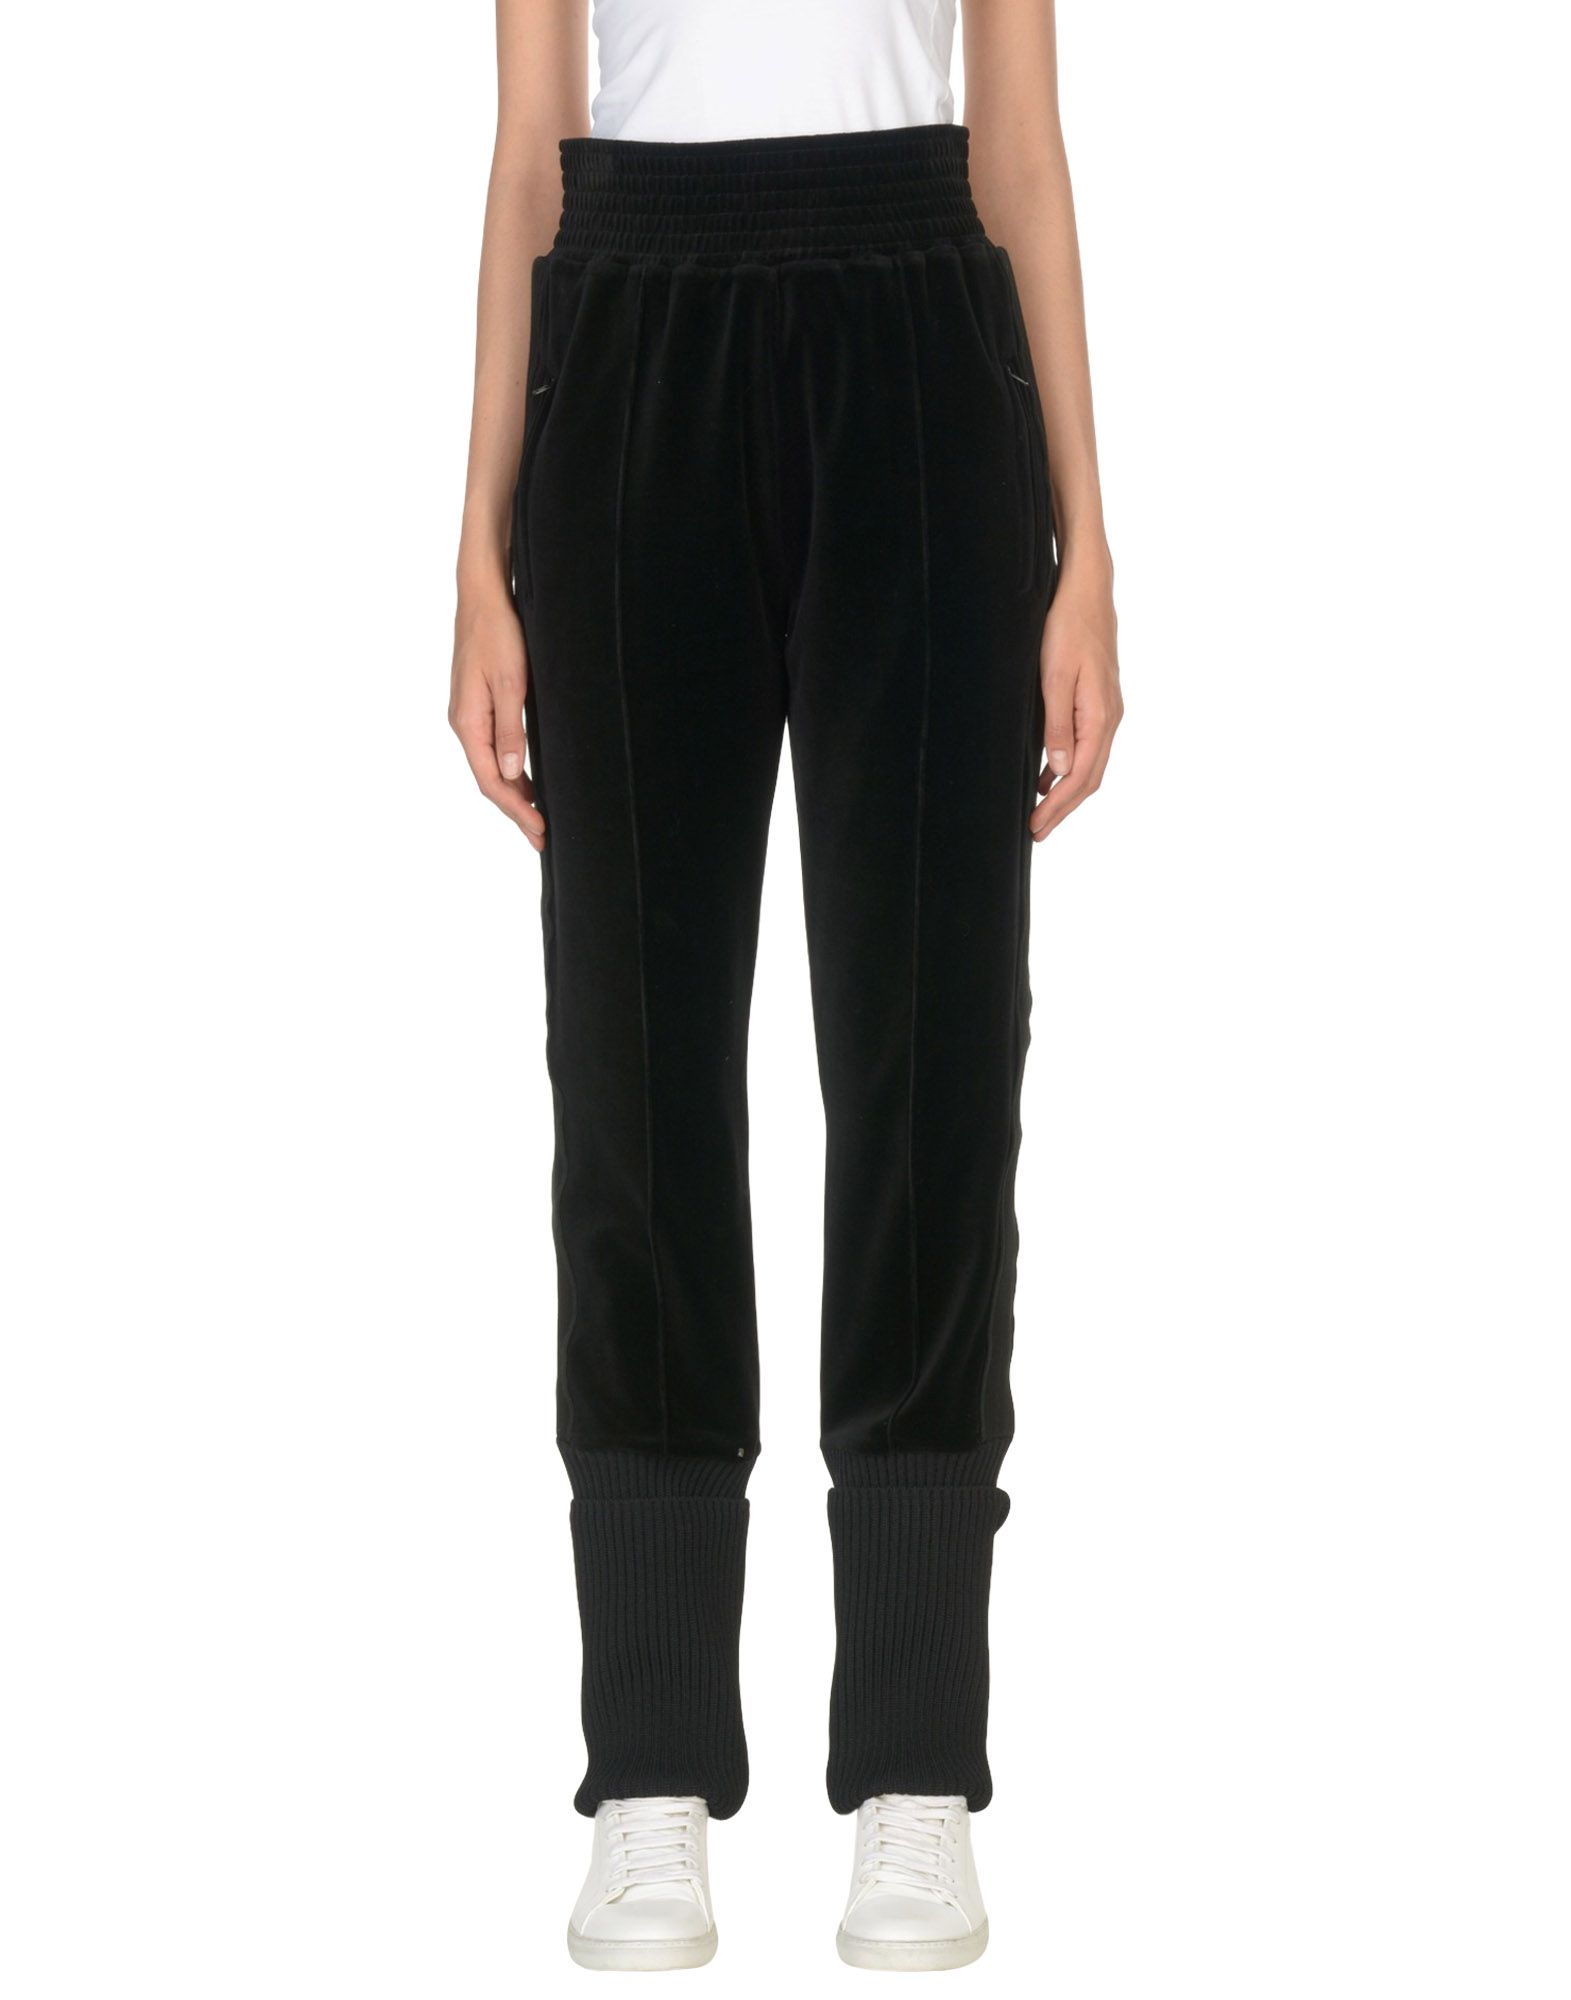 Pantalone Givenchy damen - 13185926IQ